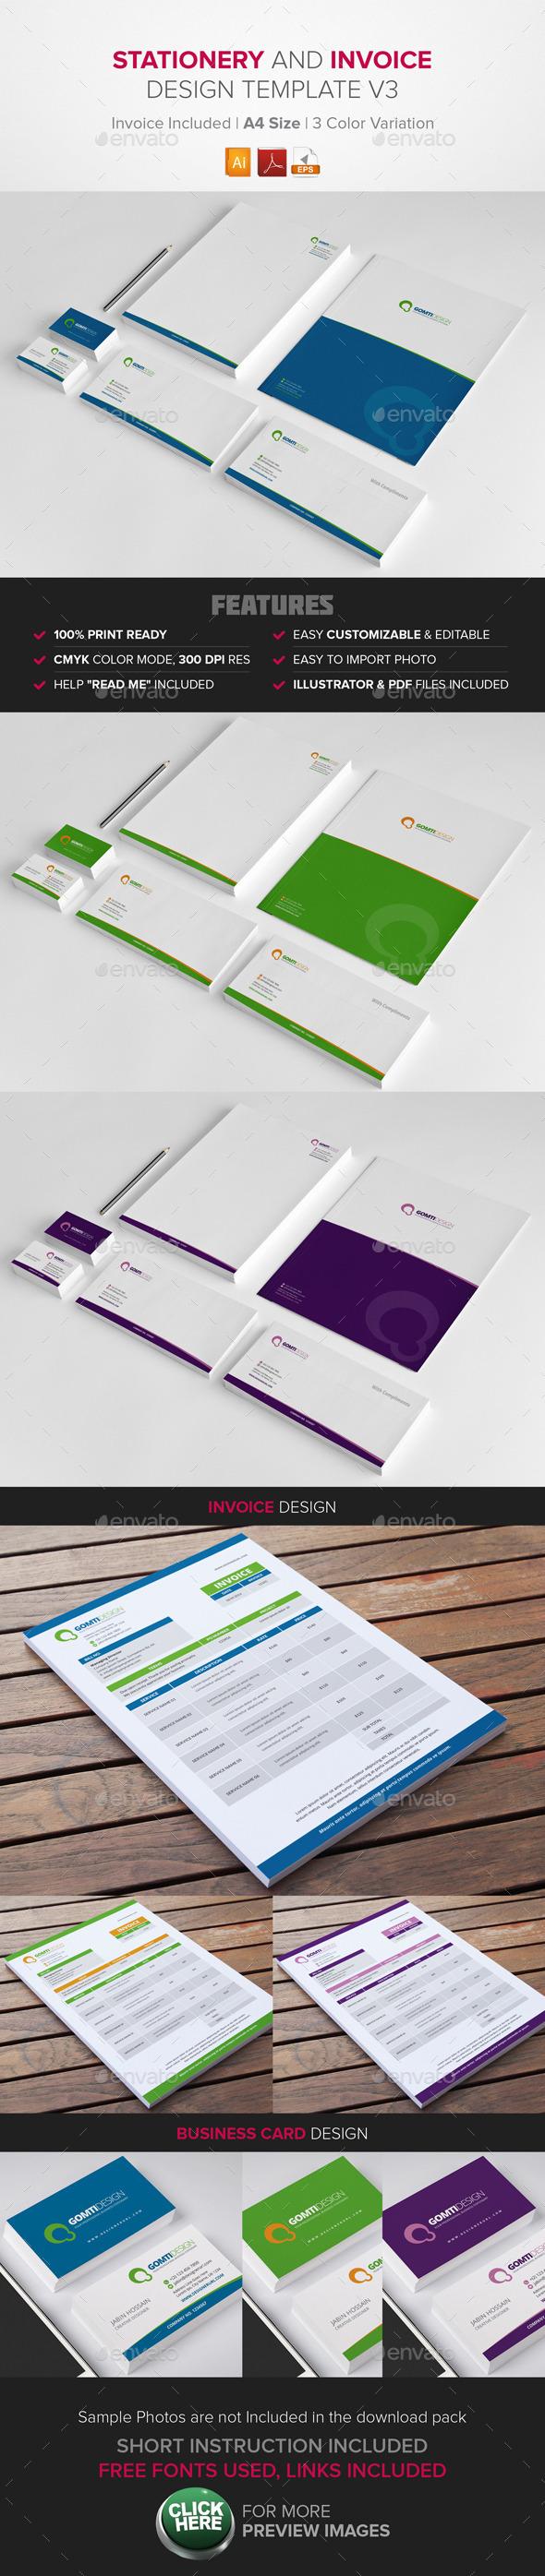 Stationery & Invoice Design Template v3